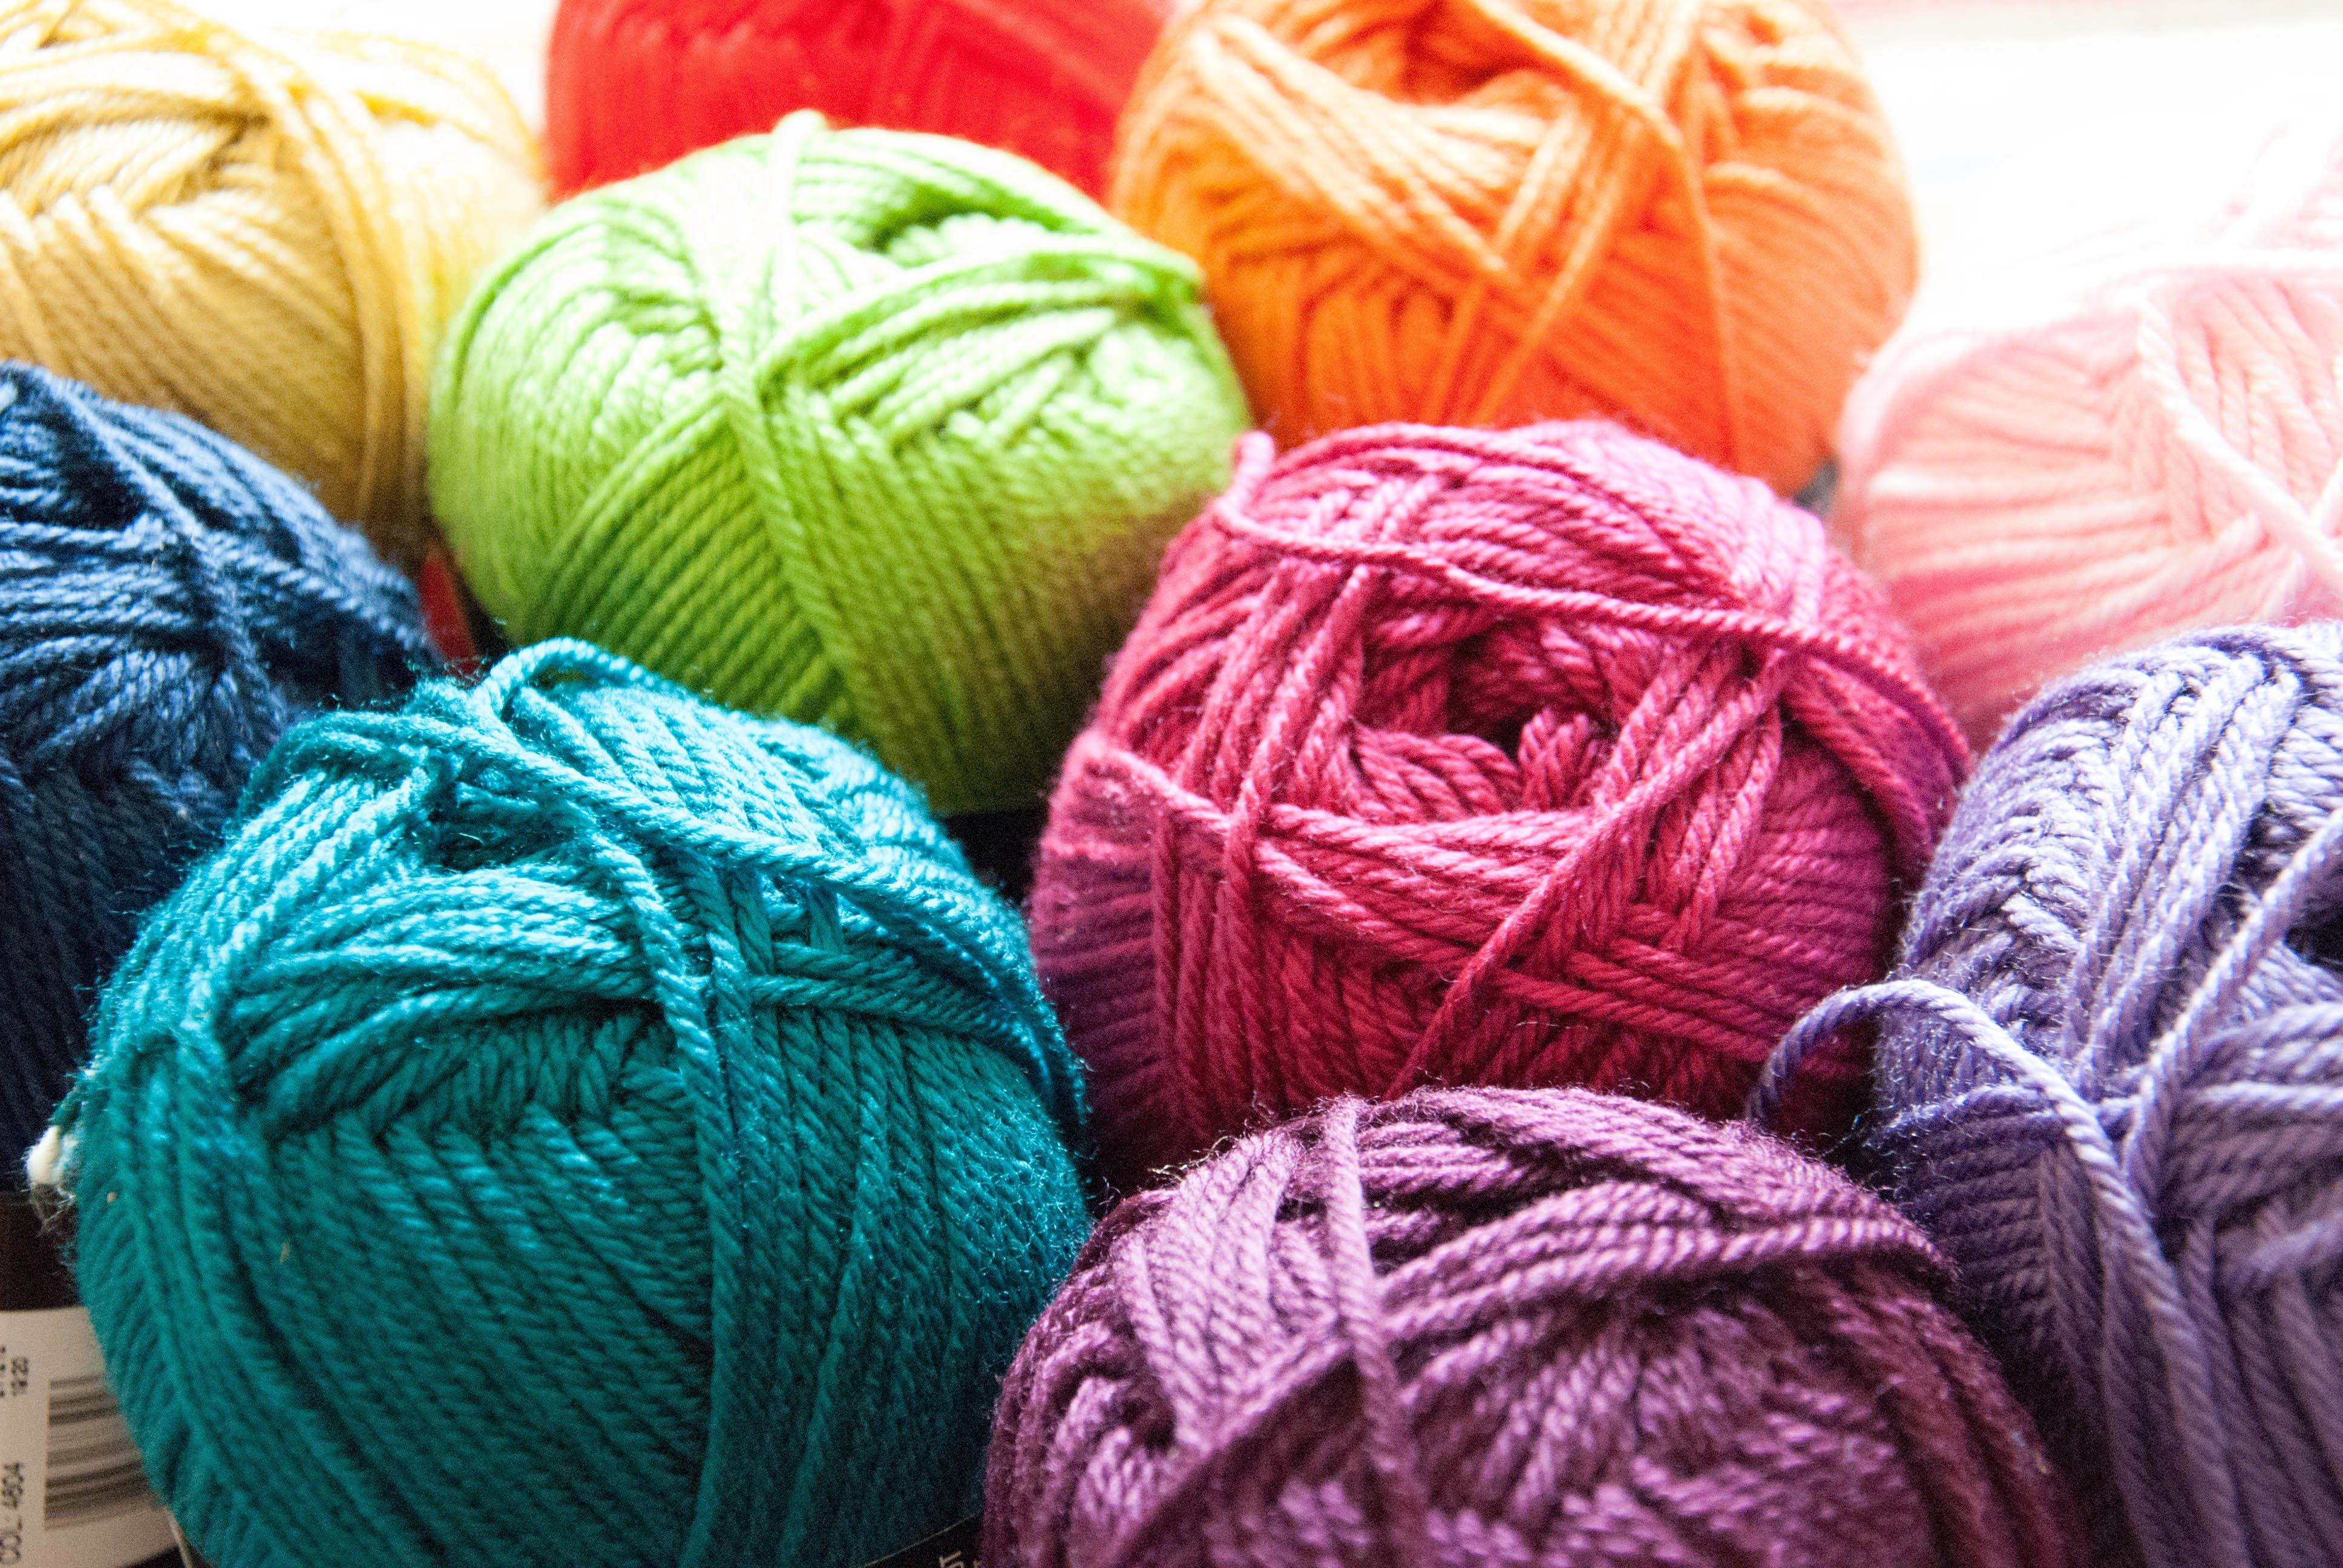 Crochet Wallpapers Wallpaper Cave